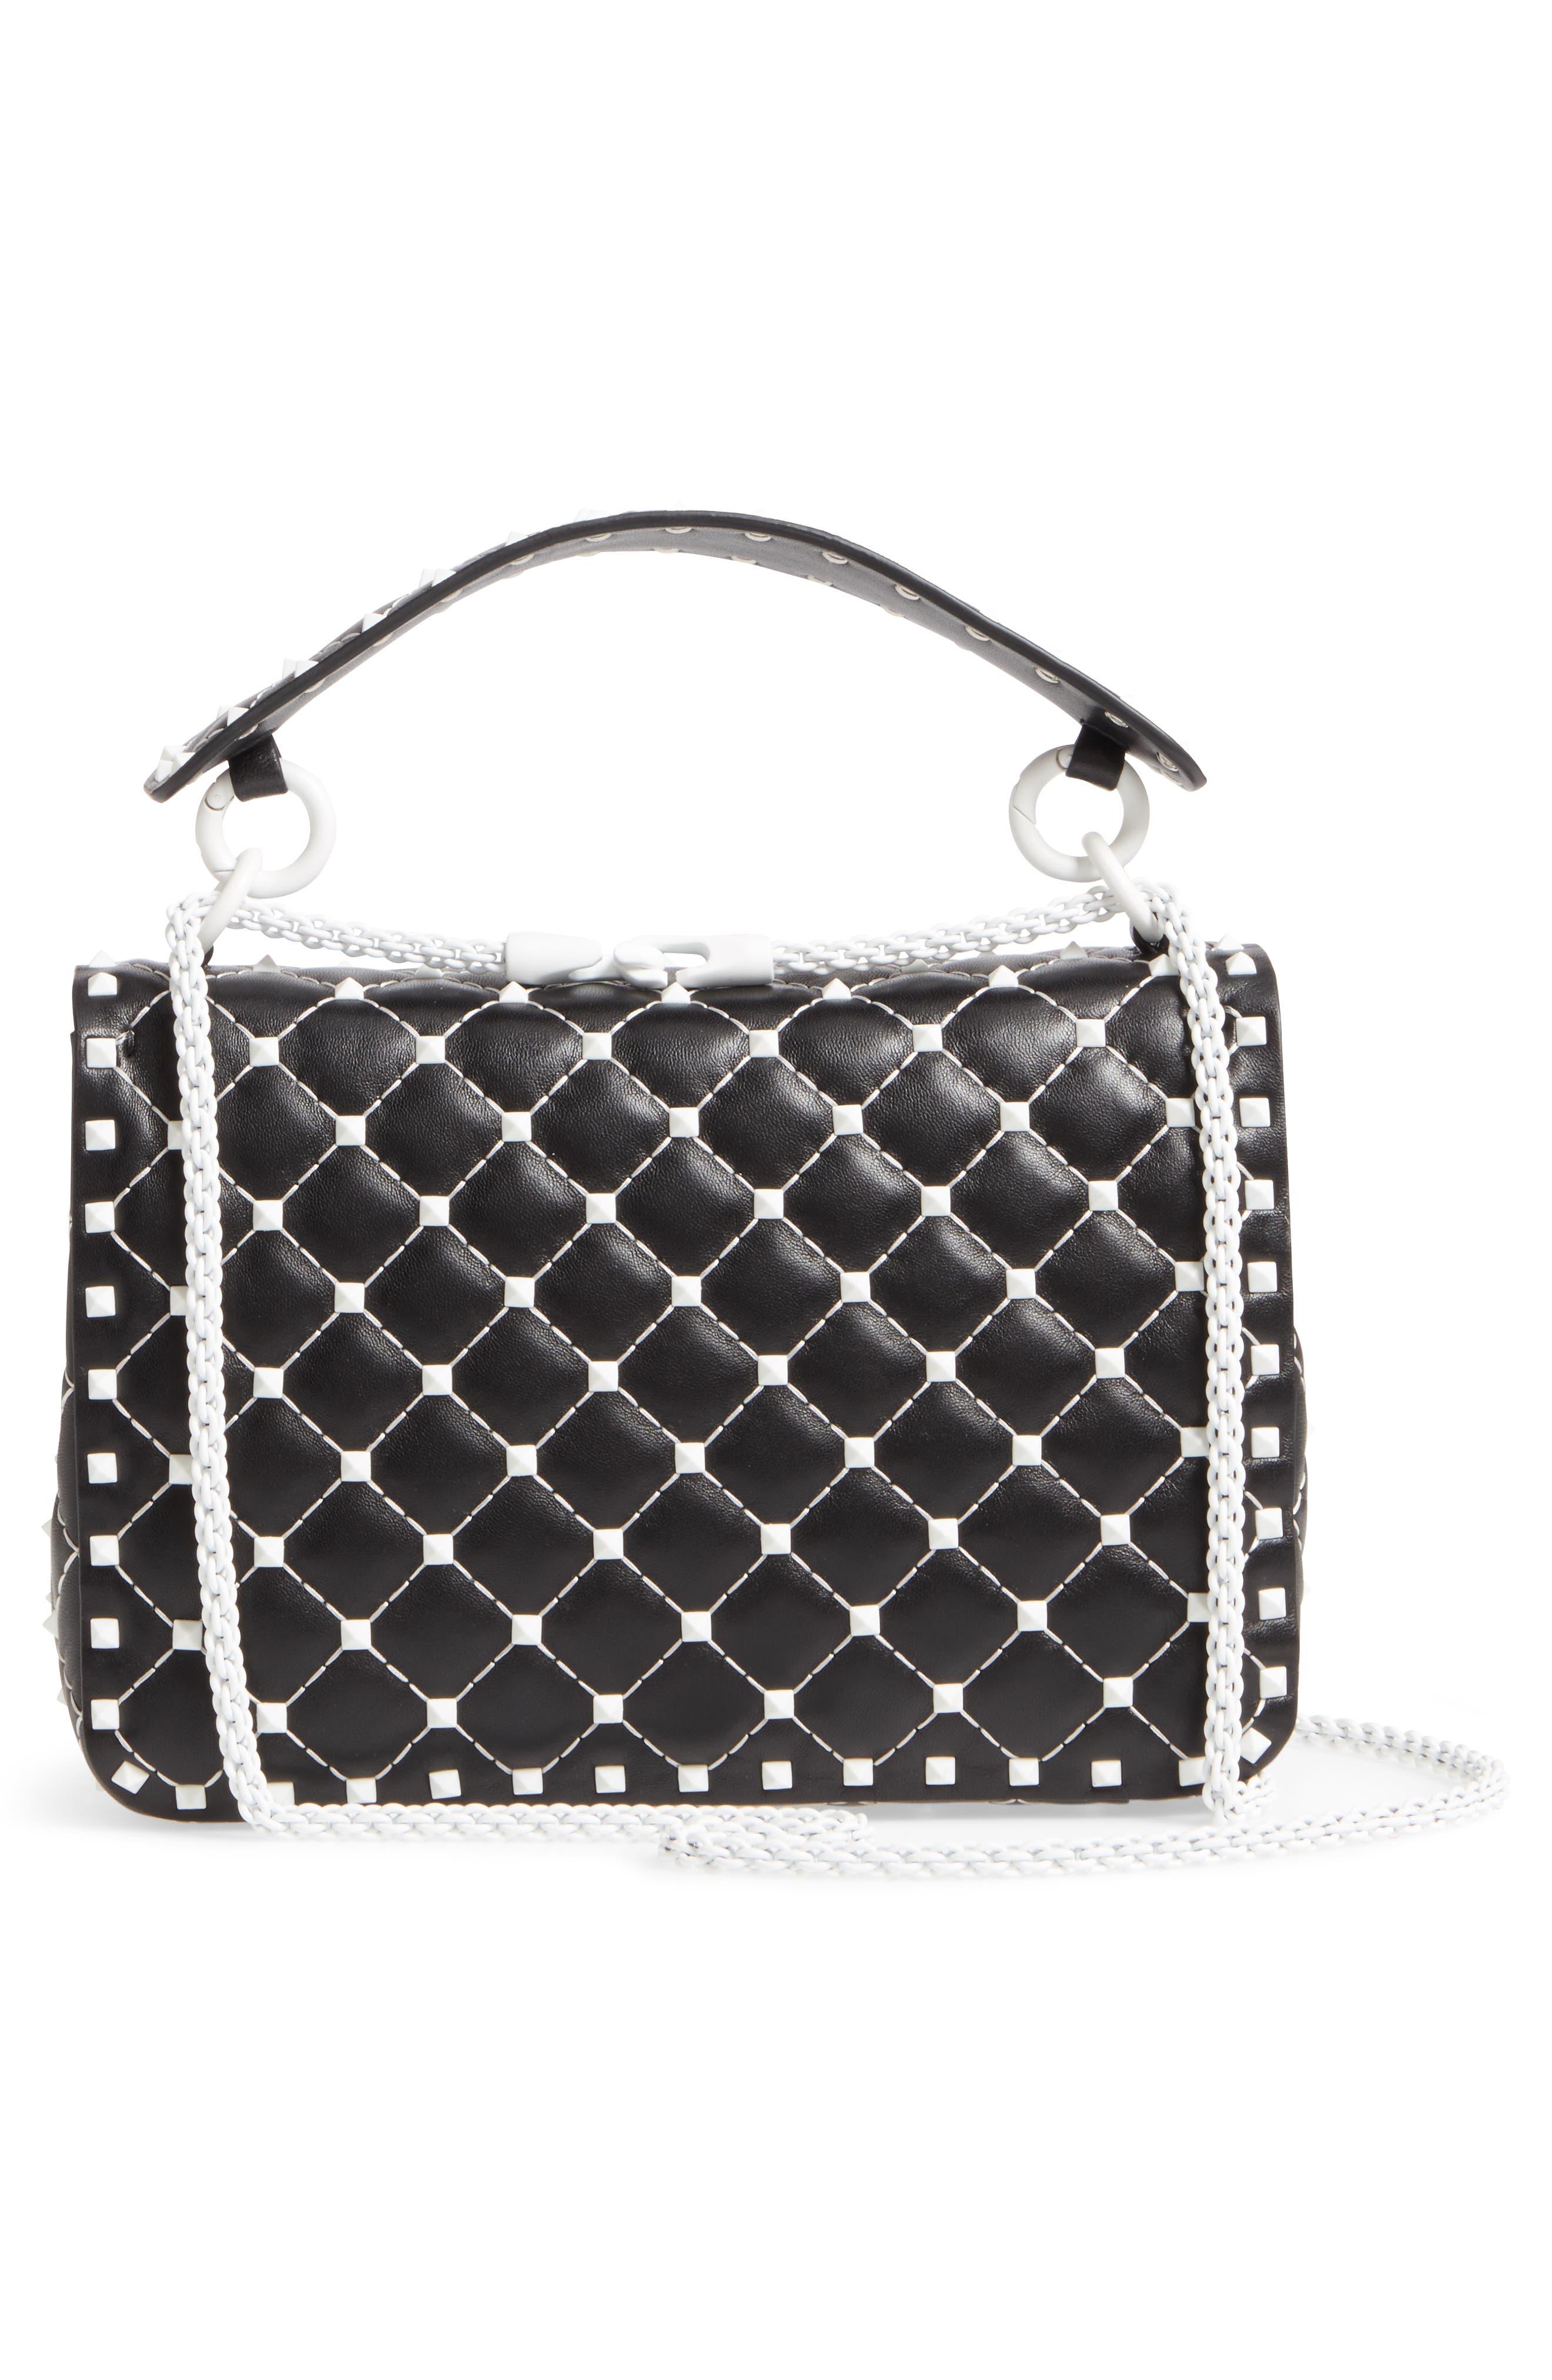 Medium Rockstud Matelassé Leather Shoulder Bag,                             Alternate thumbnail 3, color,                             Black